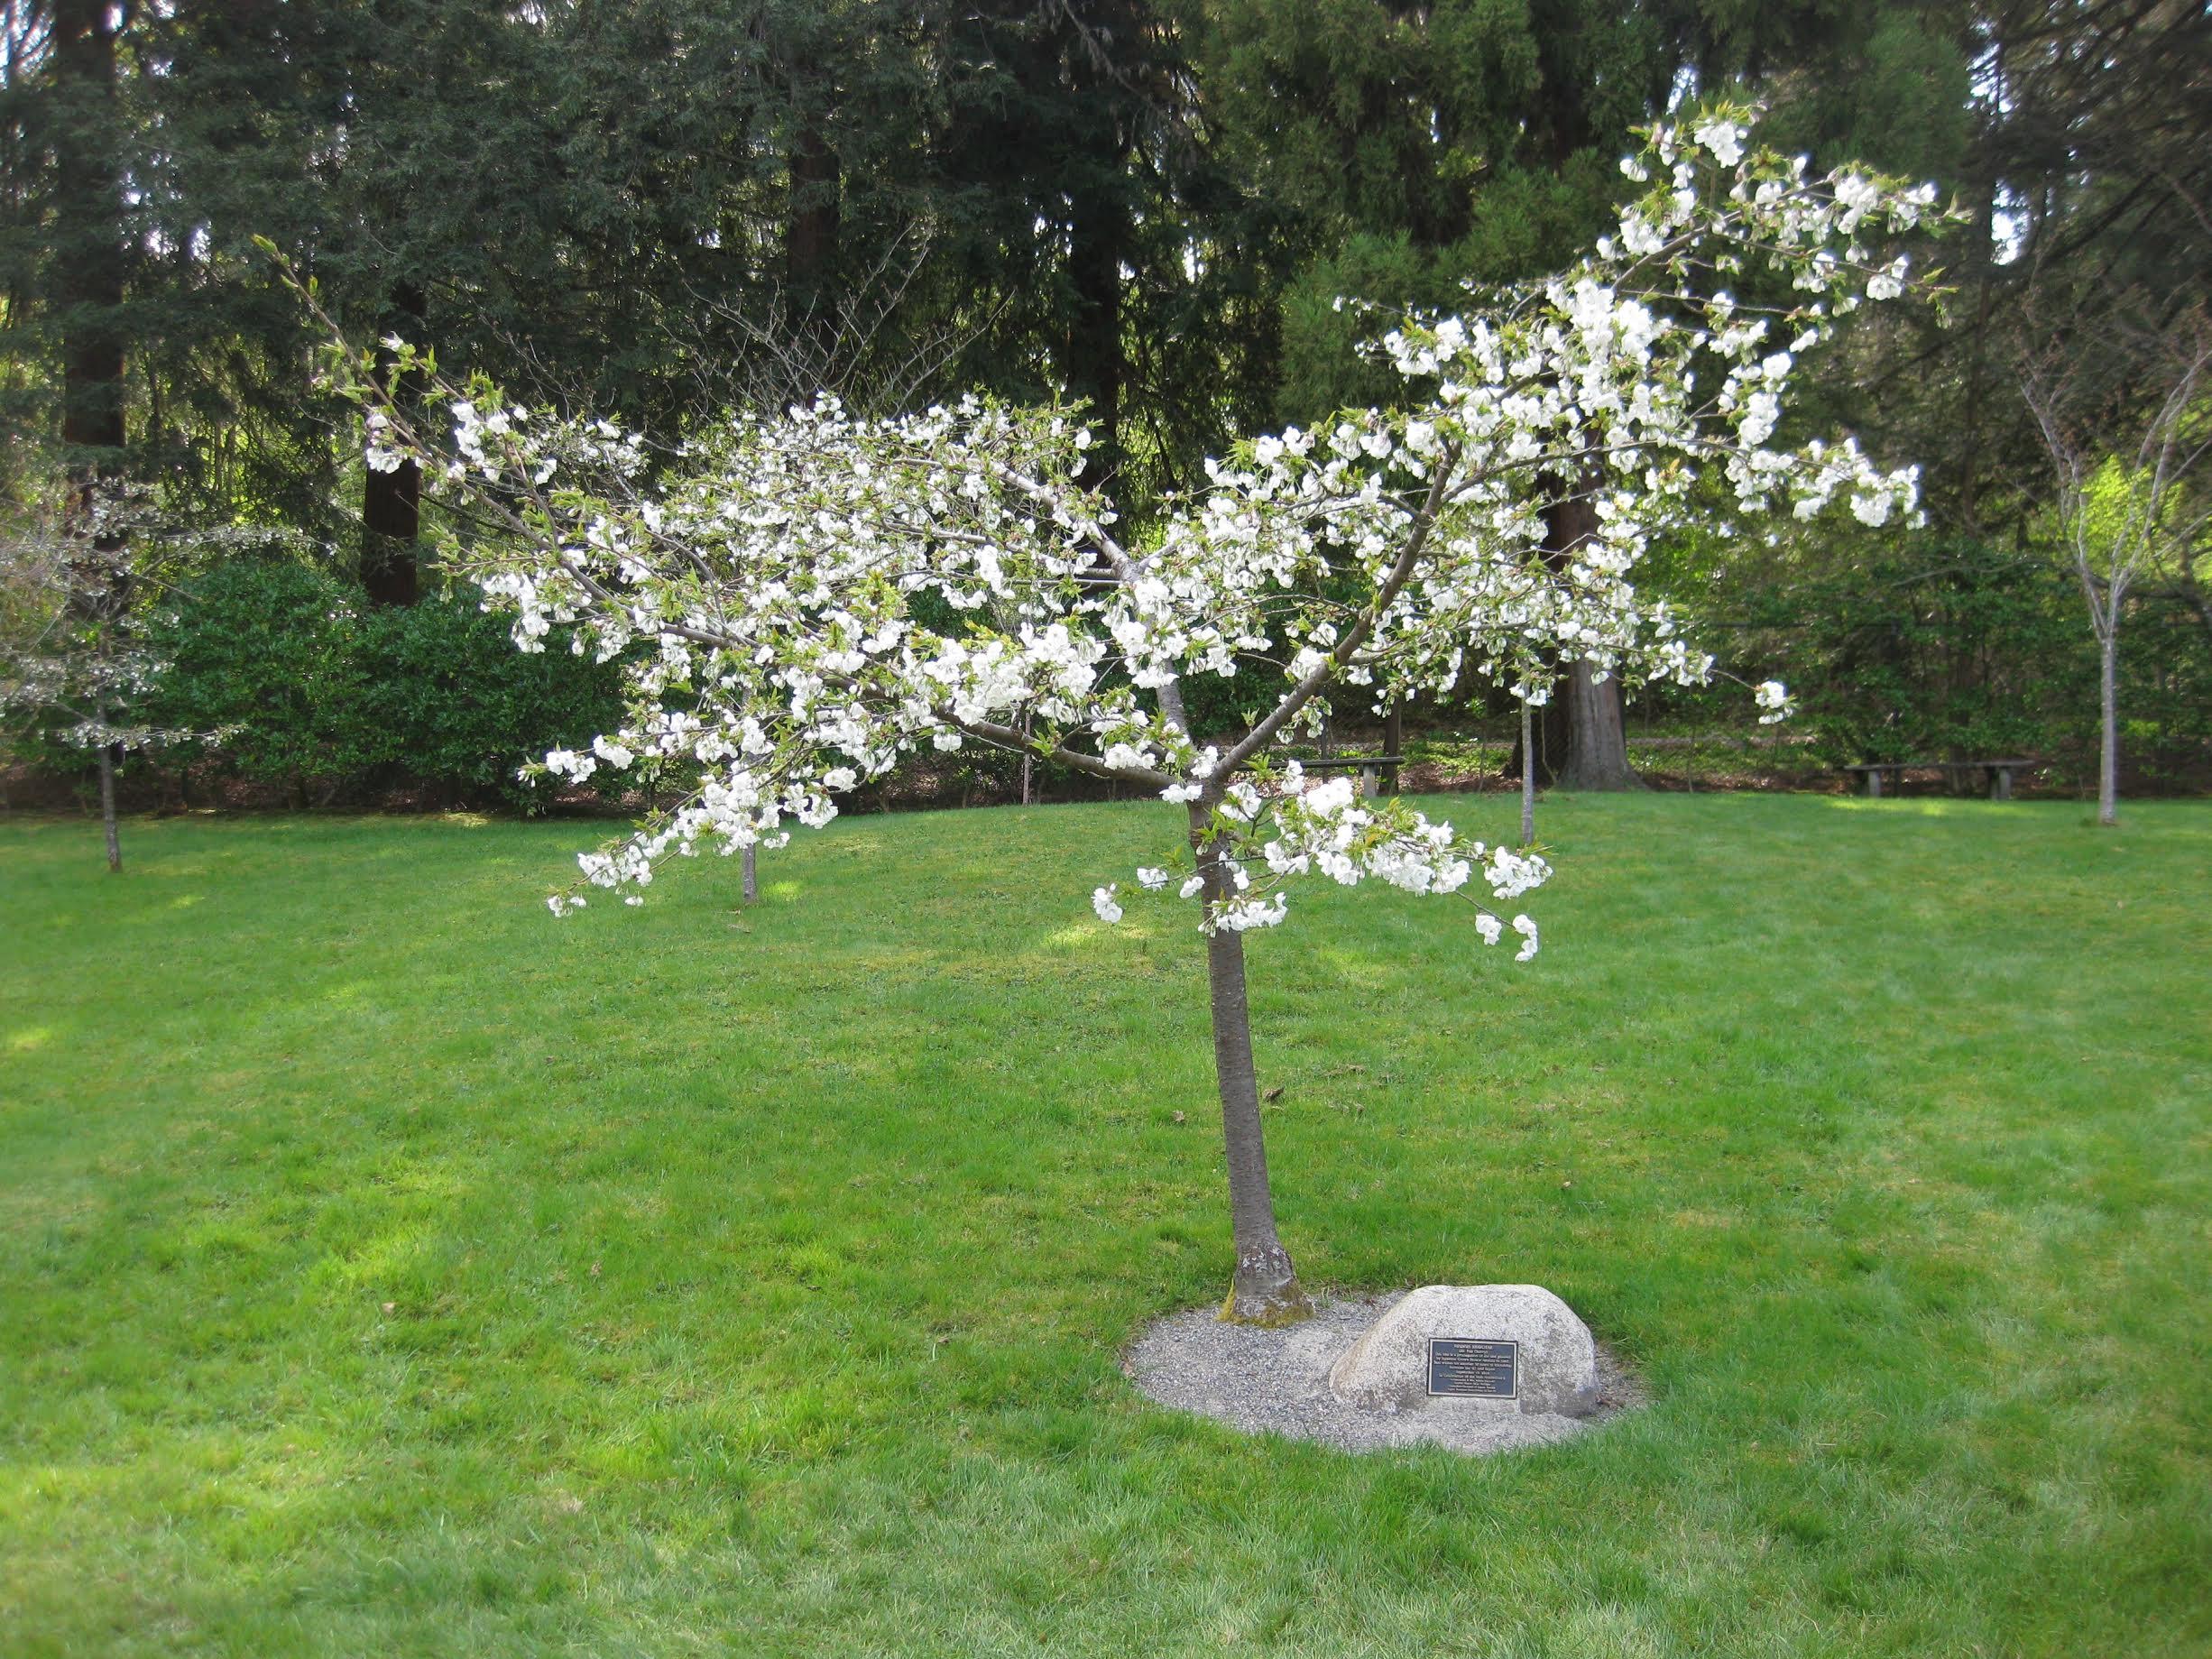 'Shirotae' flowering cherry (photo by Aleks Monk, 2013)